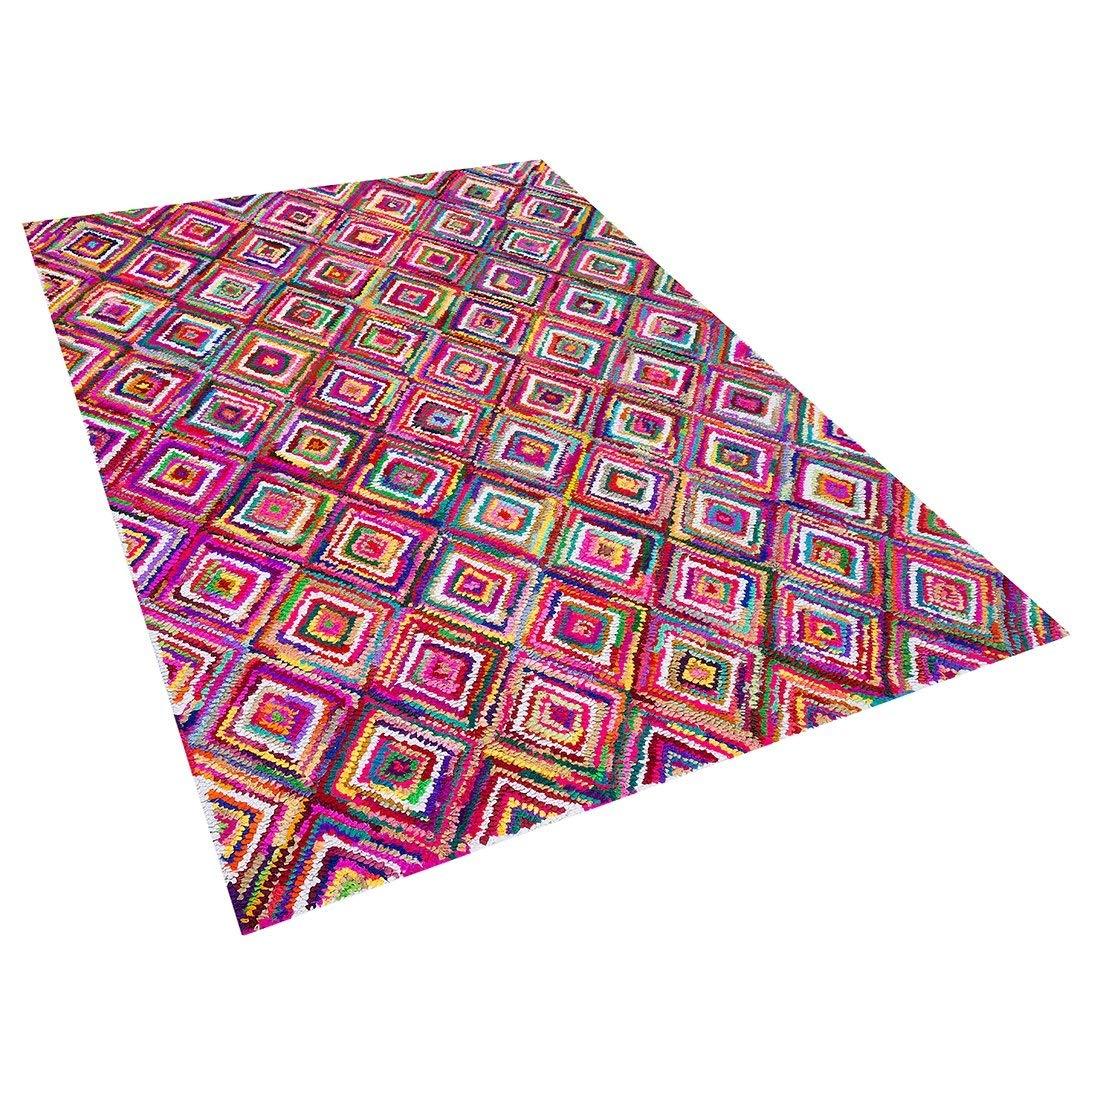 Beliani Teppich bunt 160 x 230 cm Hochflor KAISERI